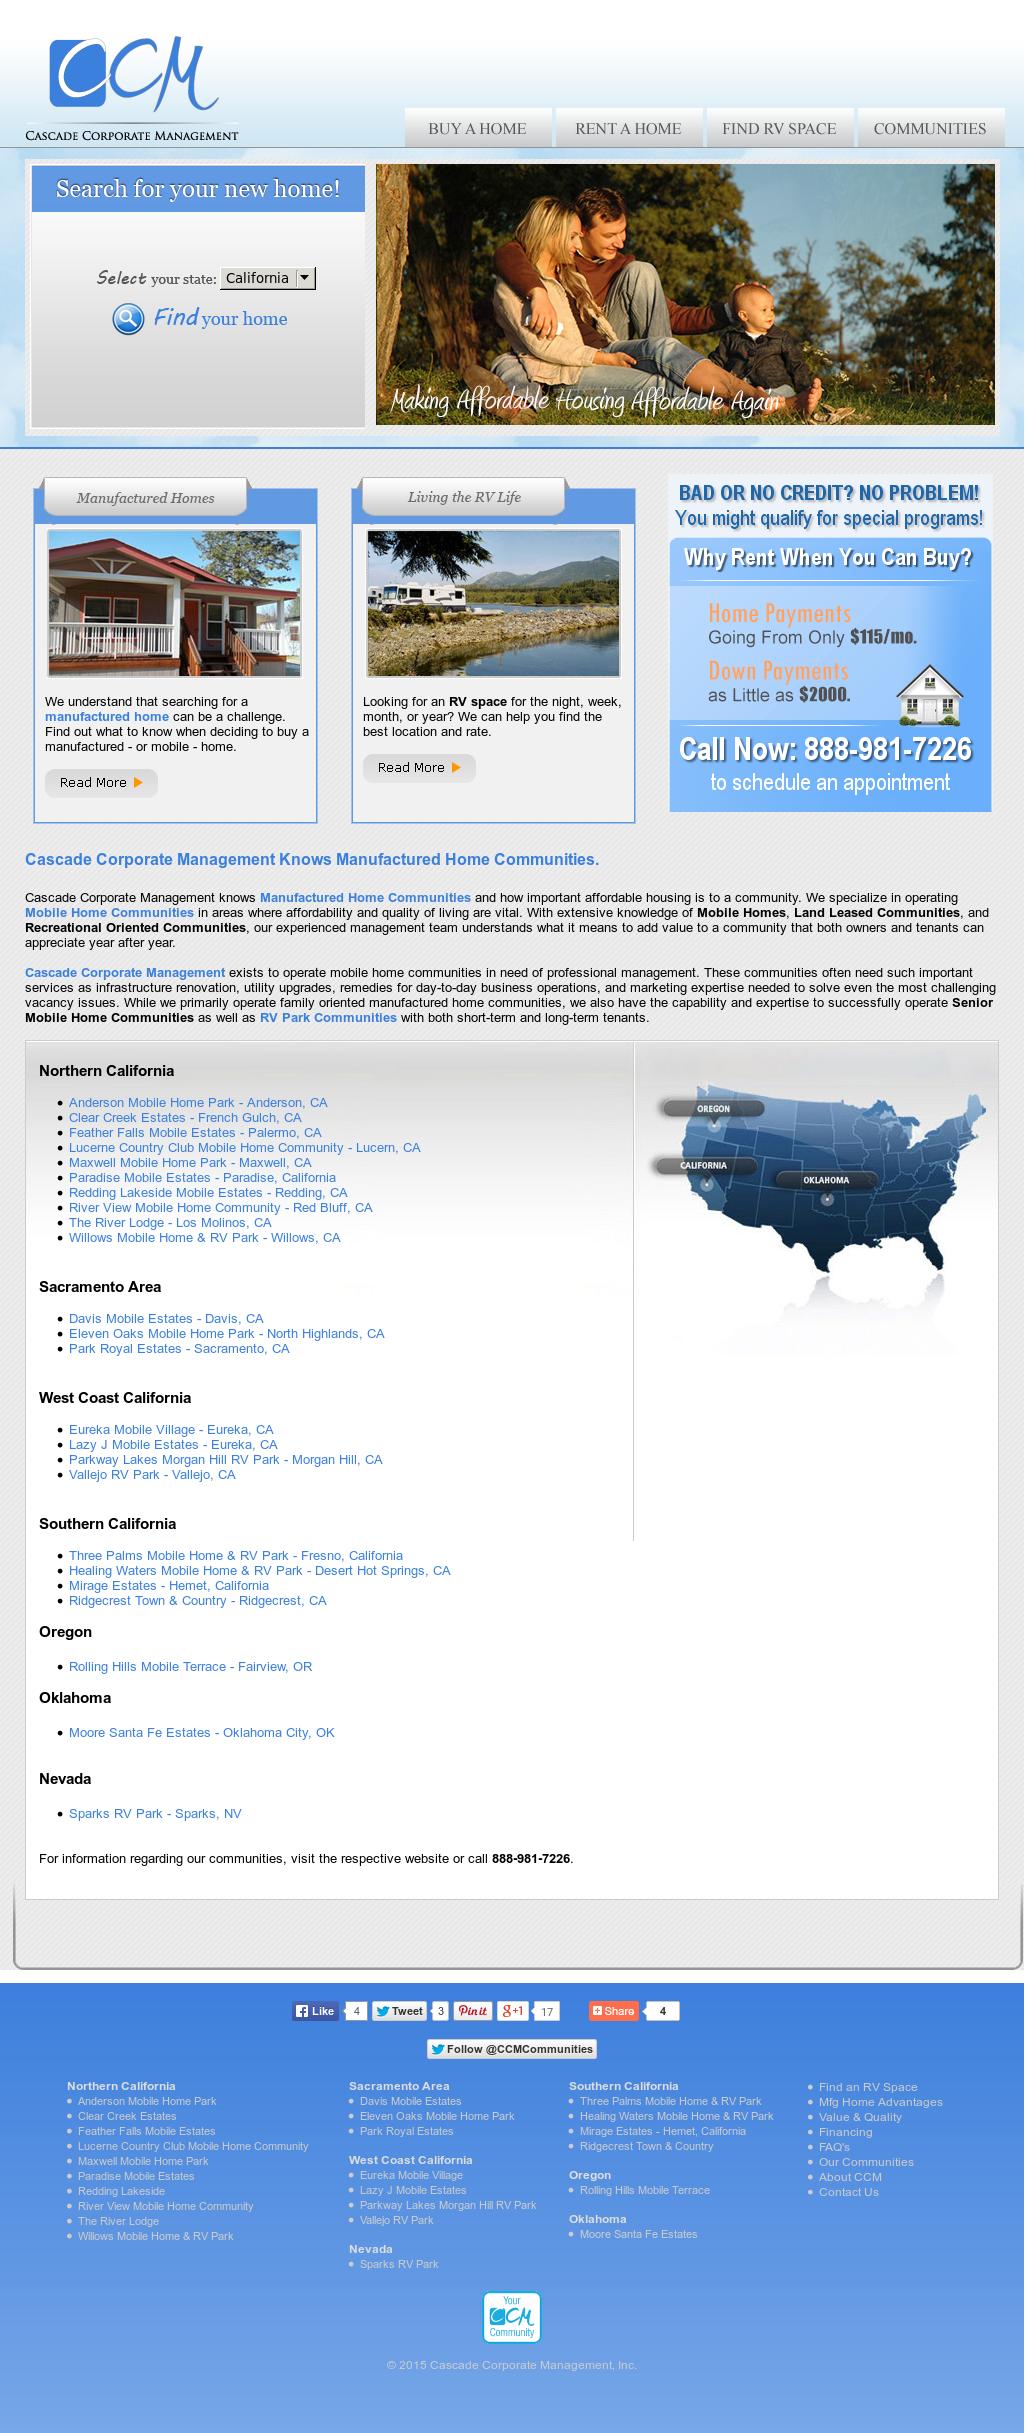 Cascade Corporate Management Competitors, Revenue and